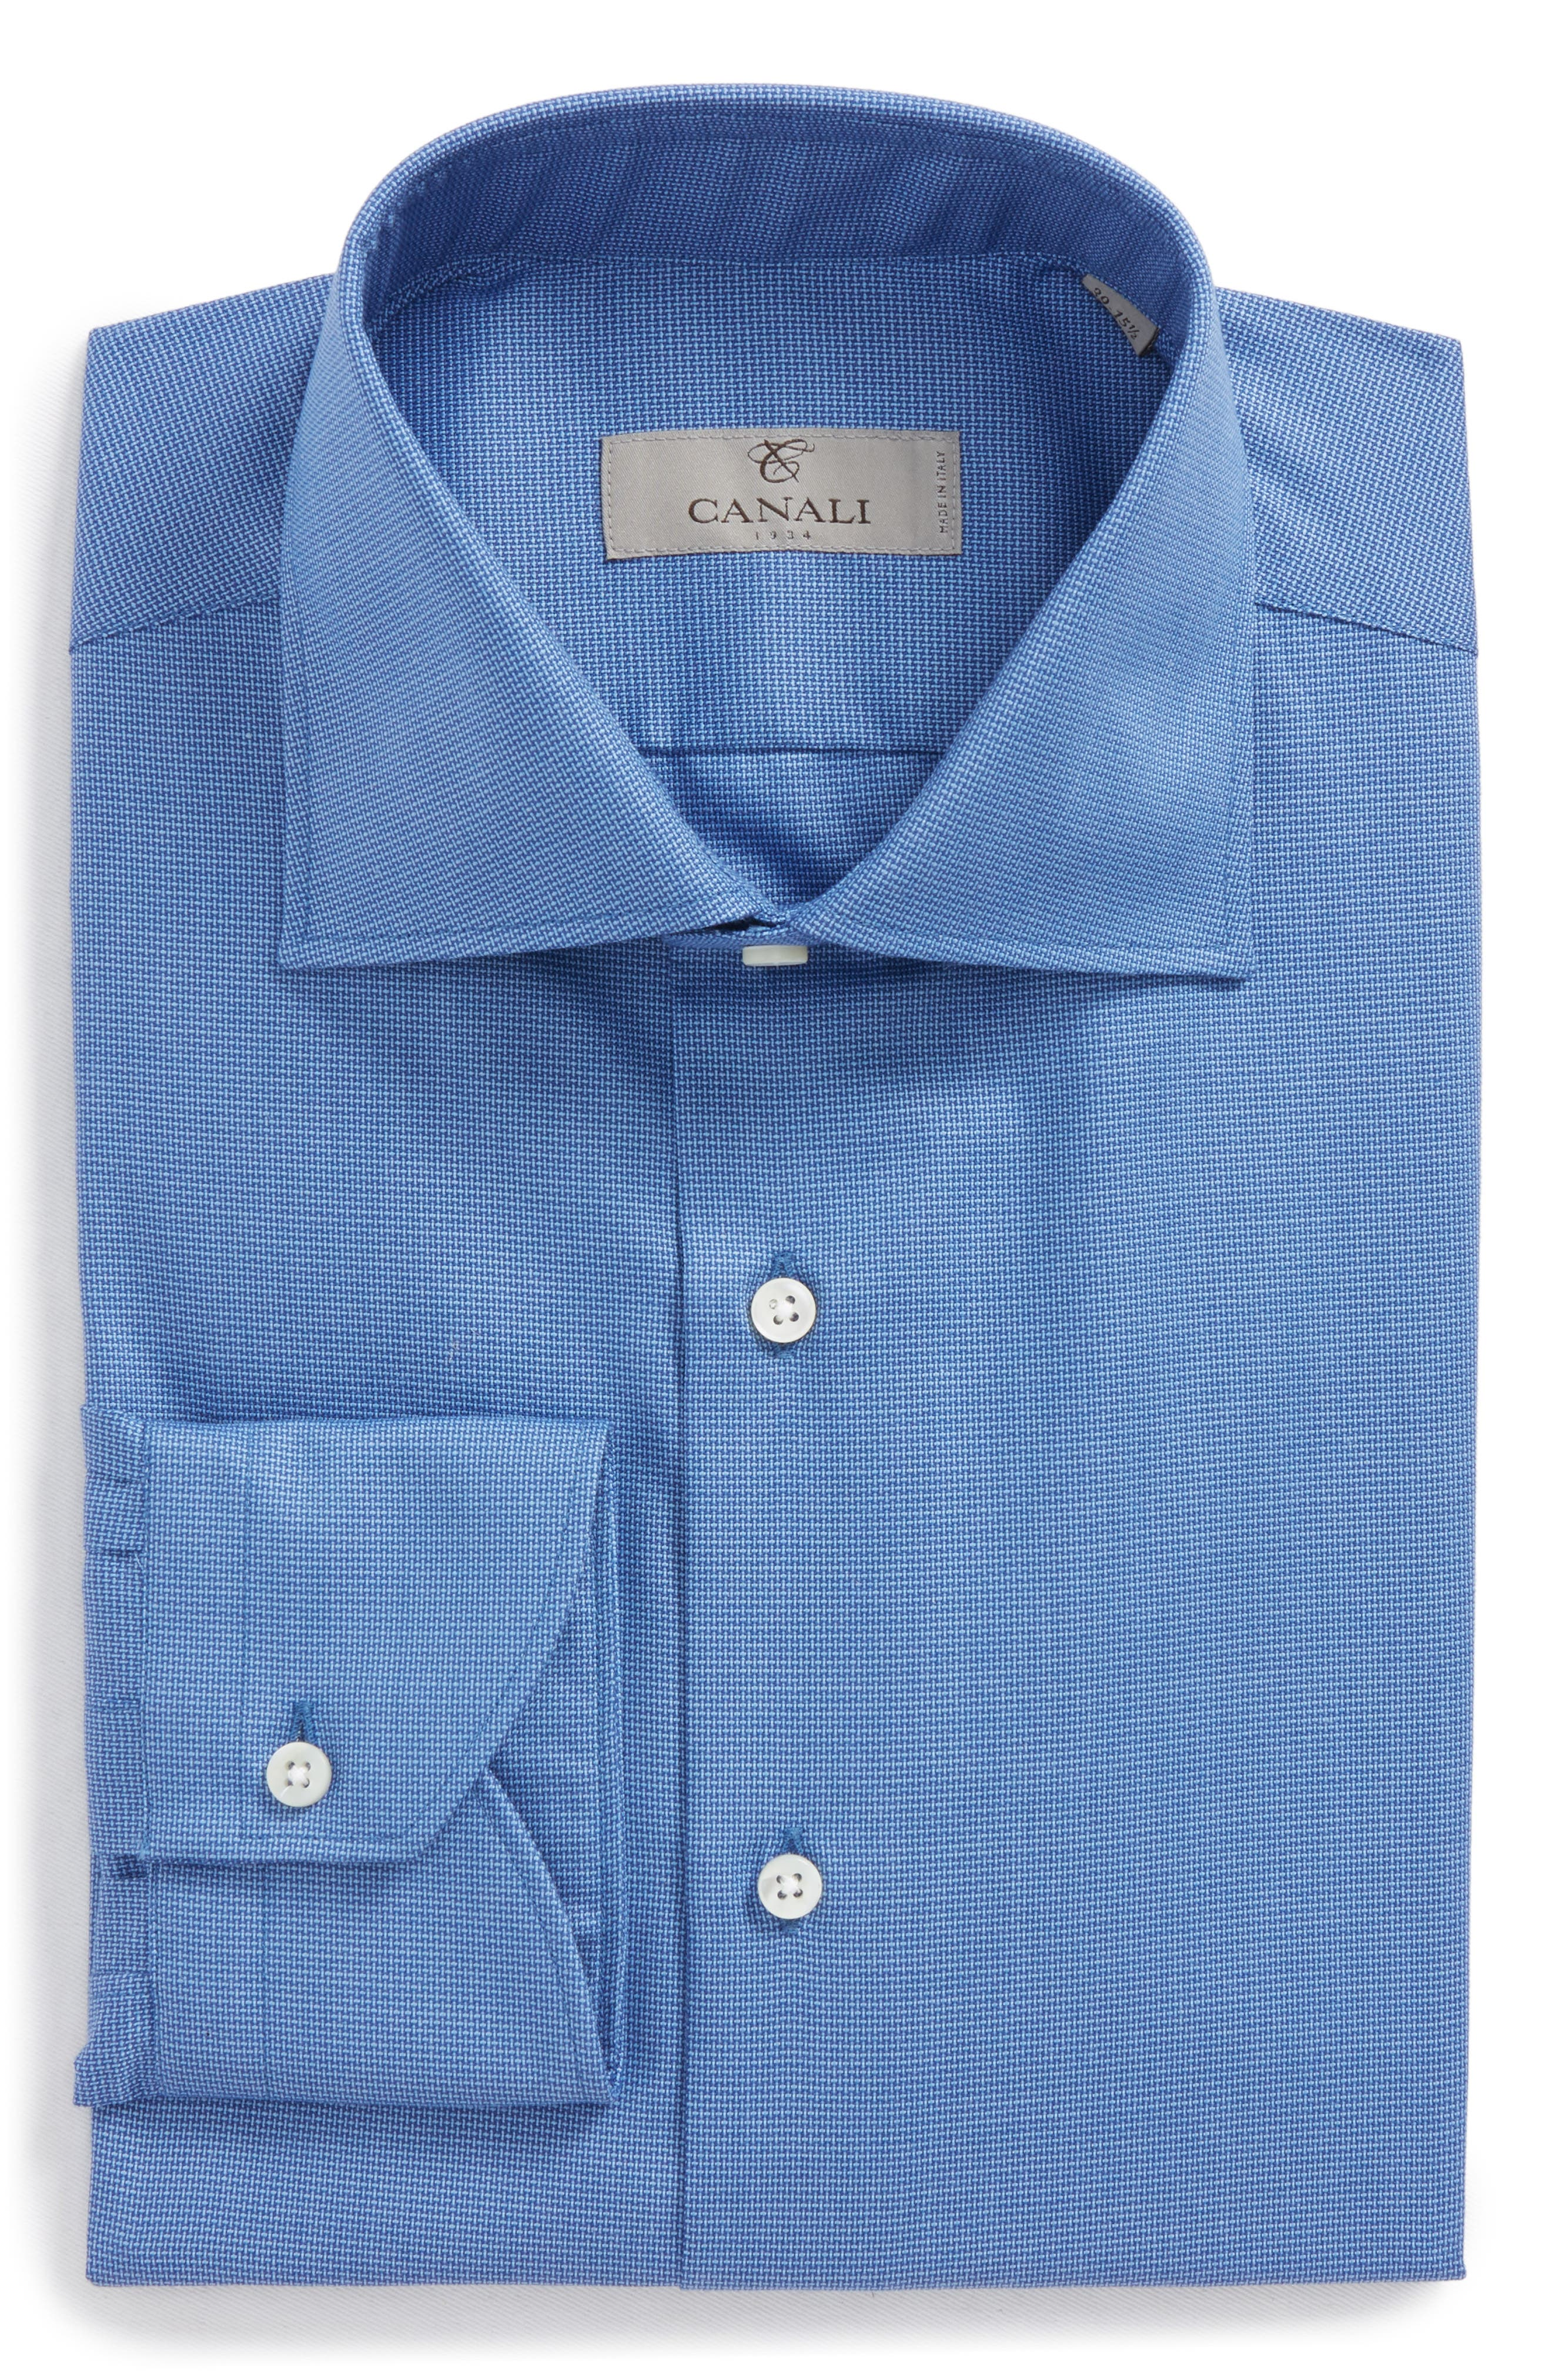 Regular Fit Solid Dress Shirt,                             Main thumbnail 1, color,                             400